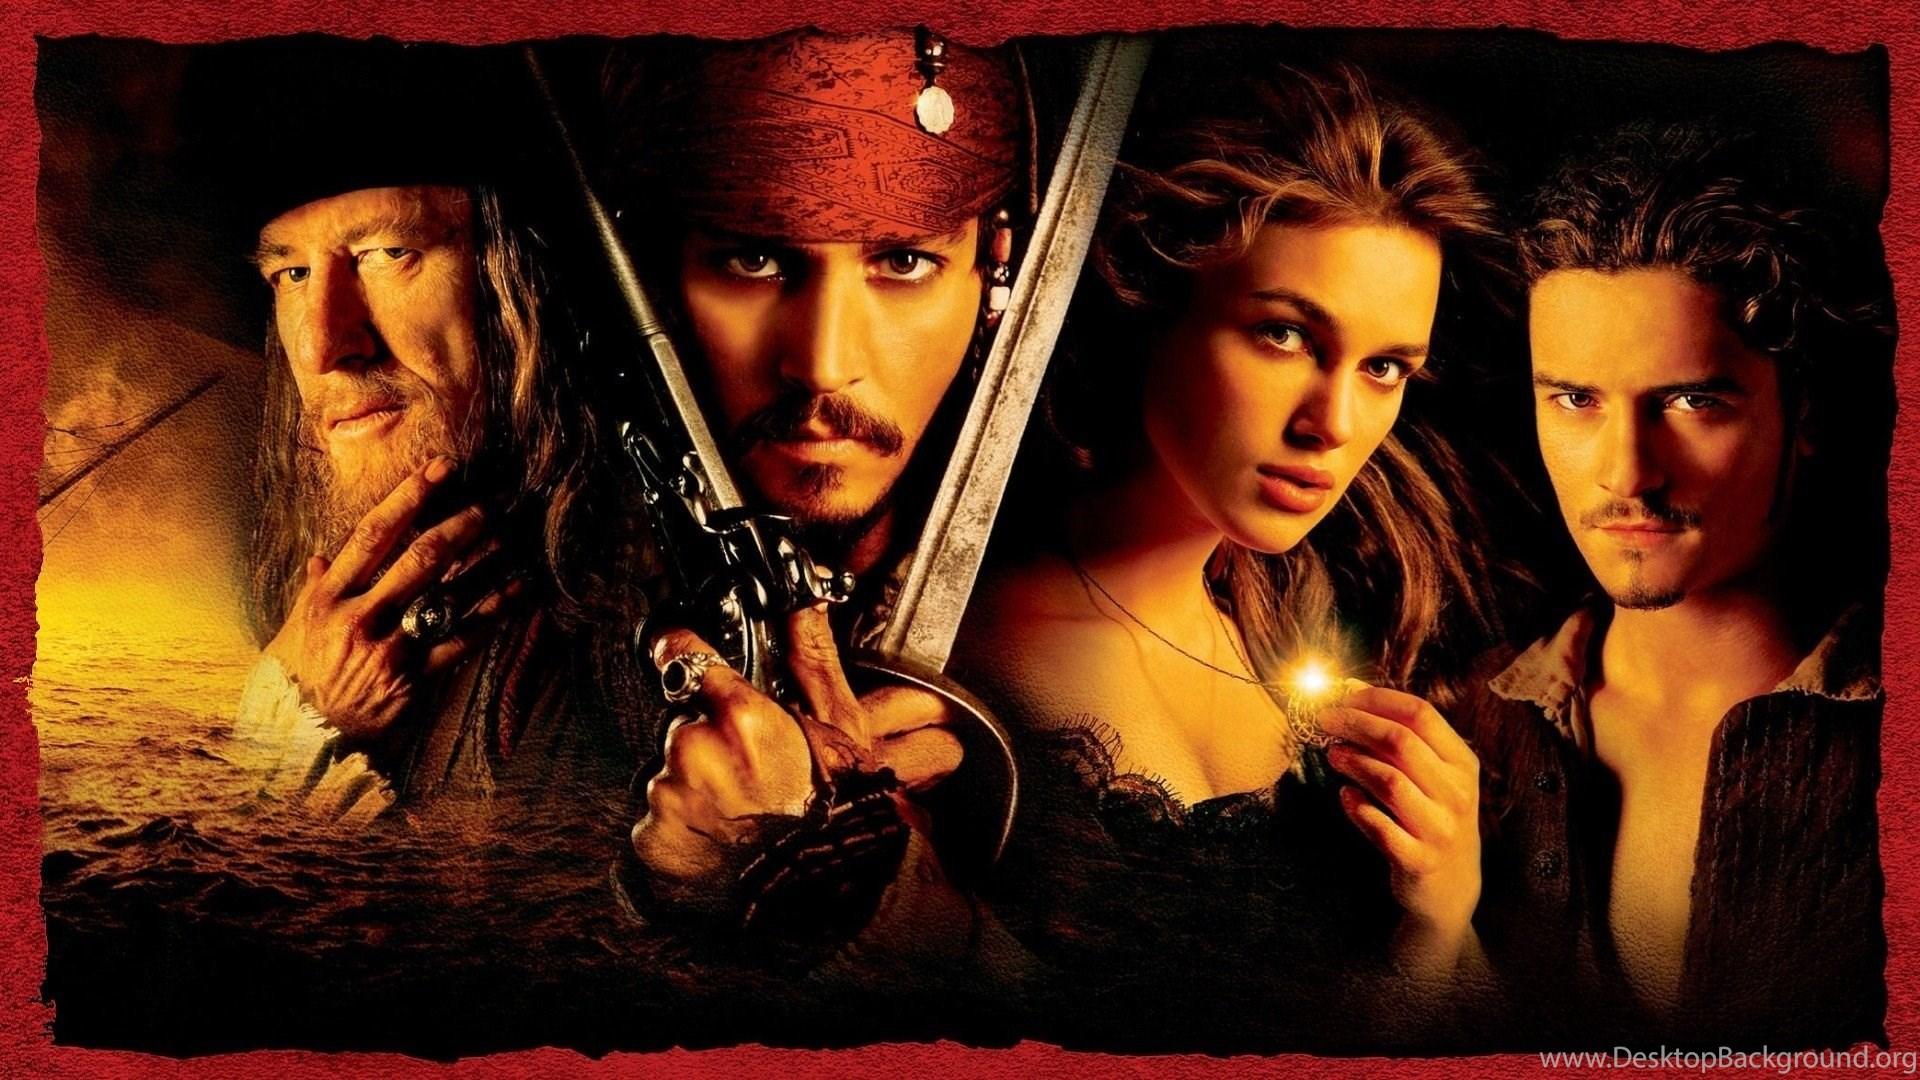 Pirates Of The Caribbean Hd Wallpaper 2 Desktop Background